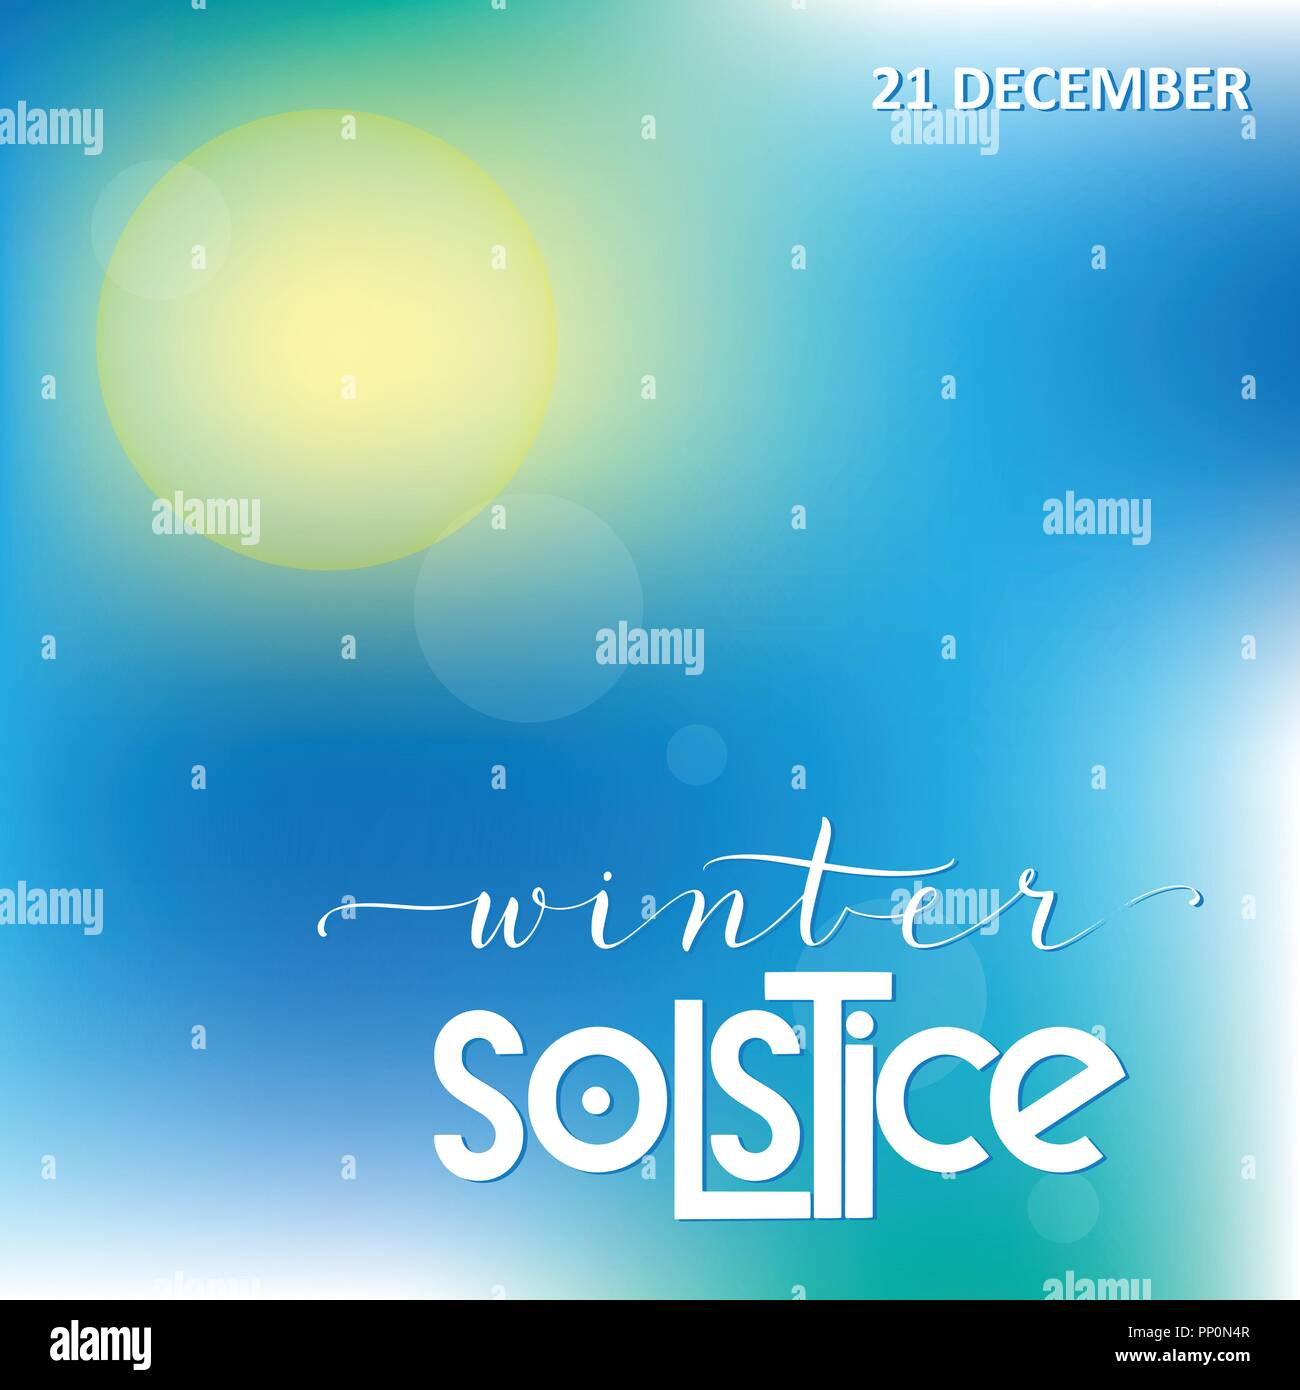 Winter solstice lettering elements for invitations posters winter solstice lettering elements for invitations posters greeting cards m4hsunfo